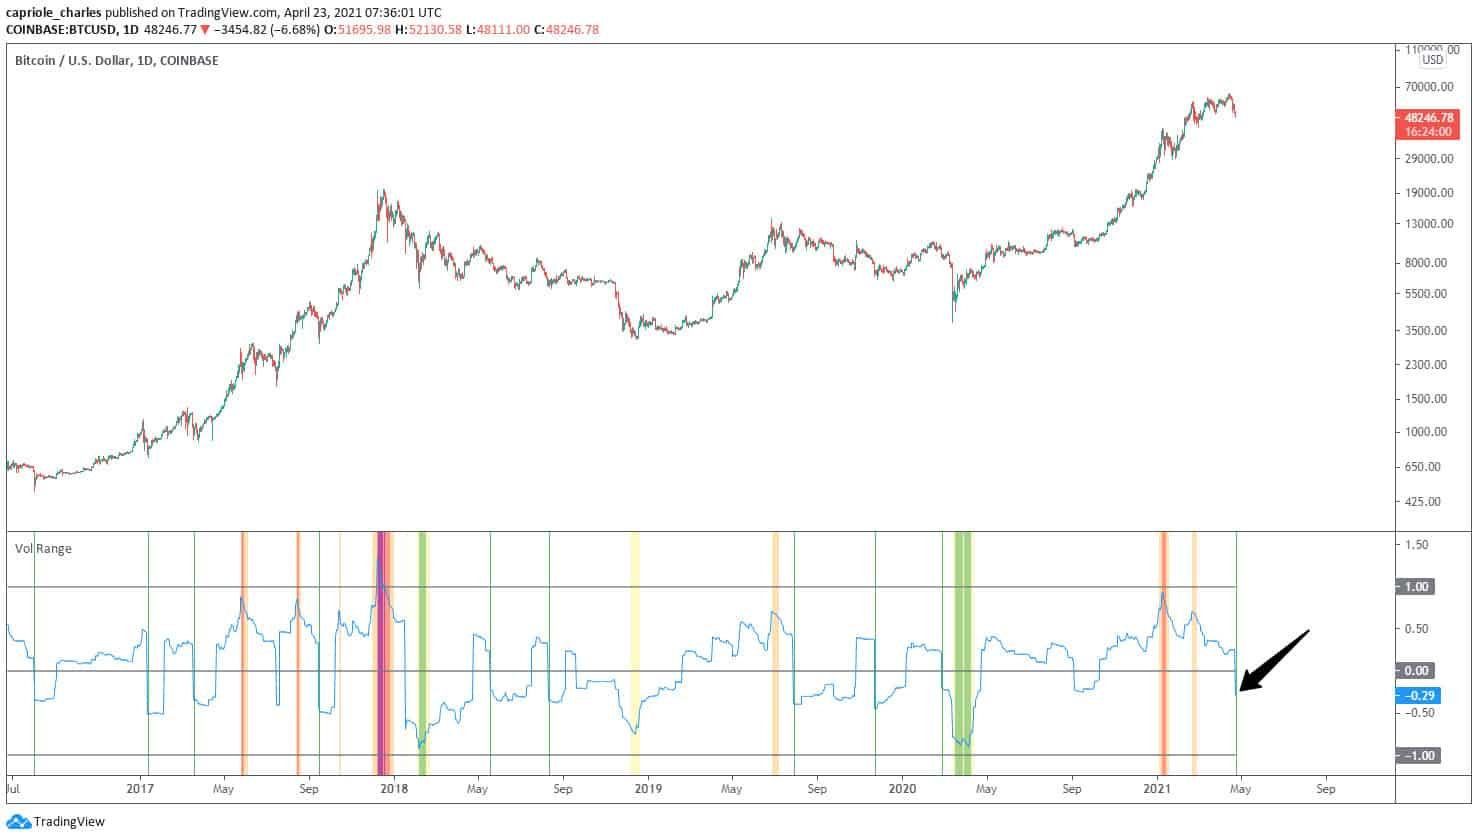 Bitcoin Price vs. Volatility Index. Source: Twitter